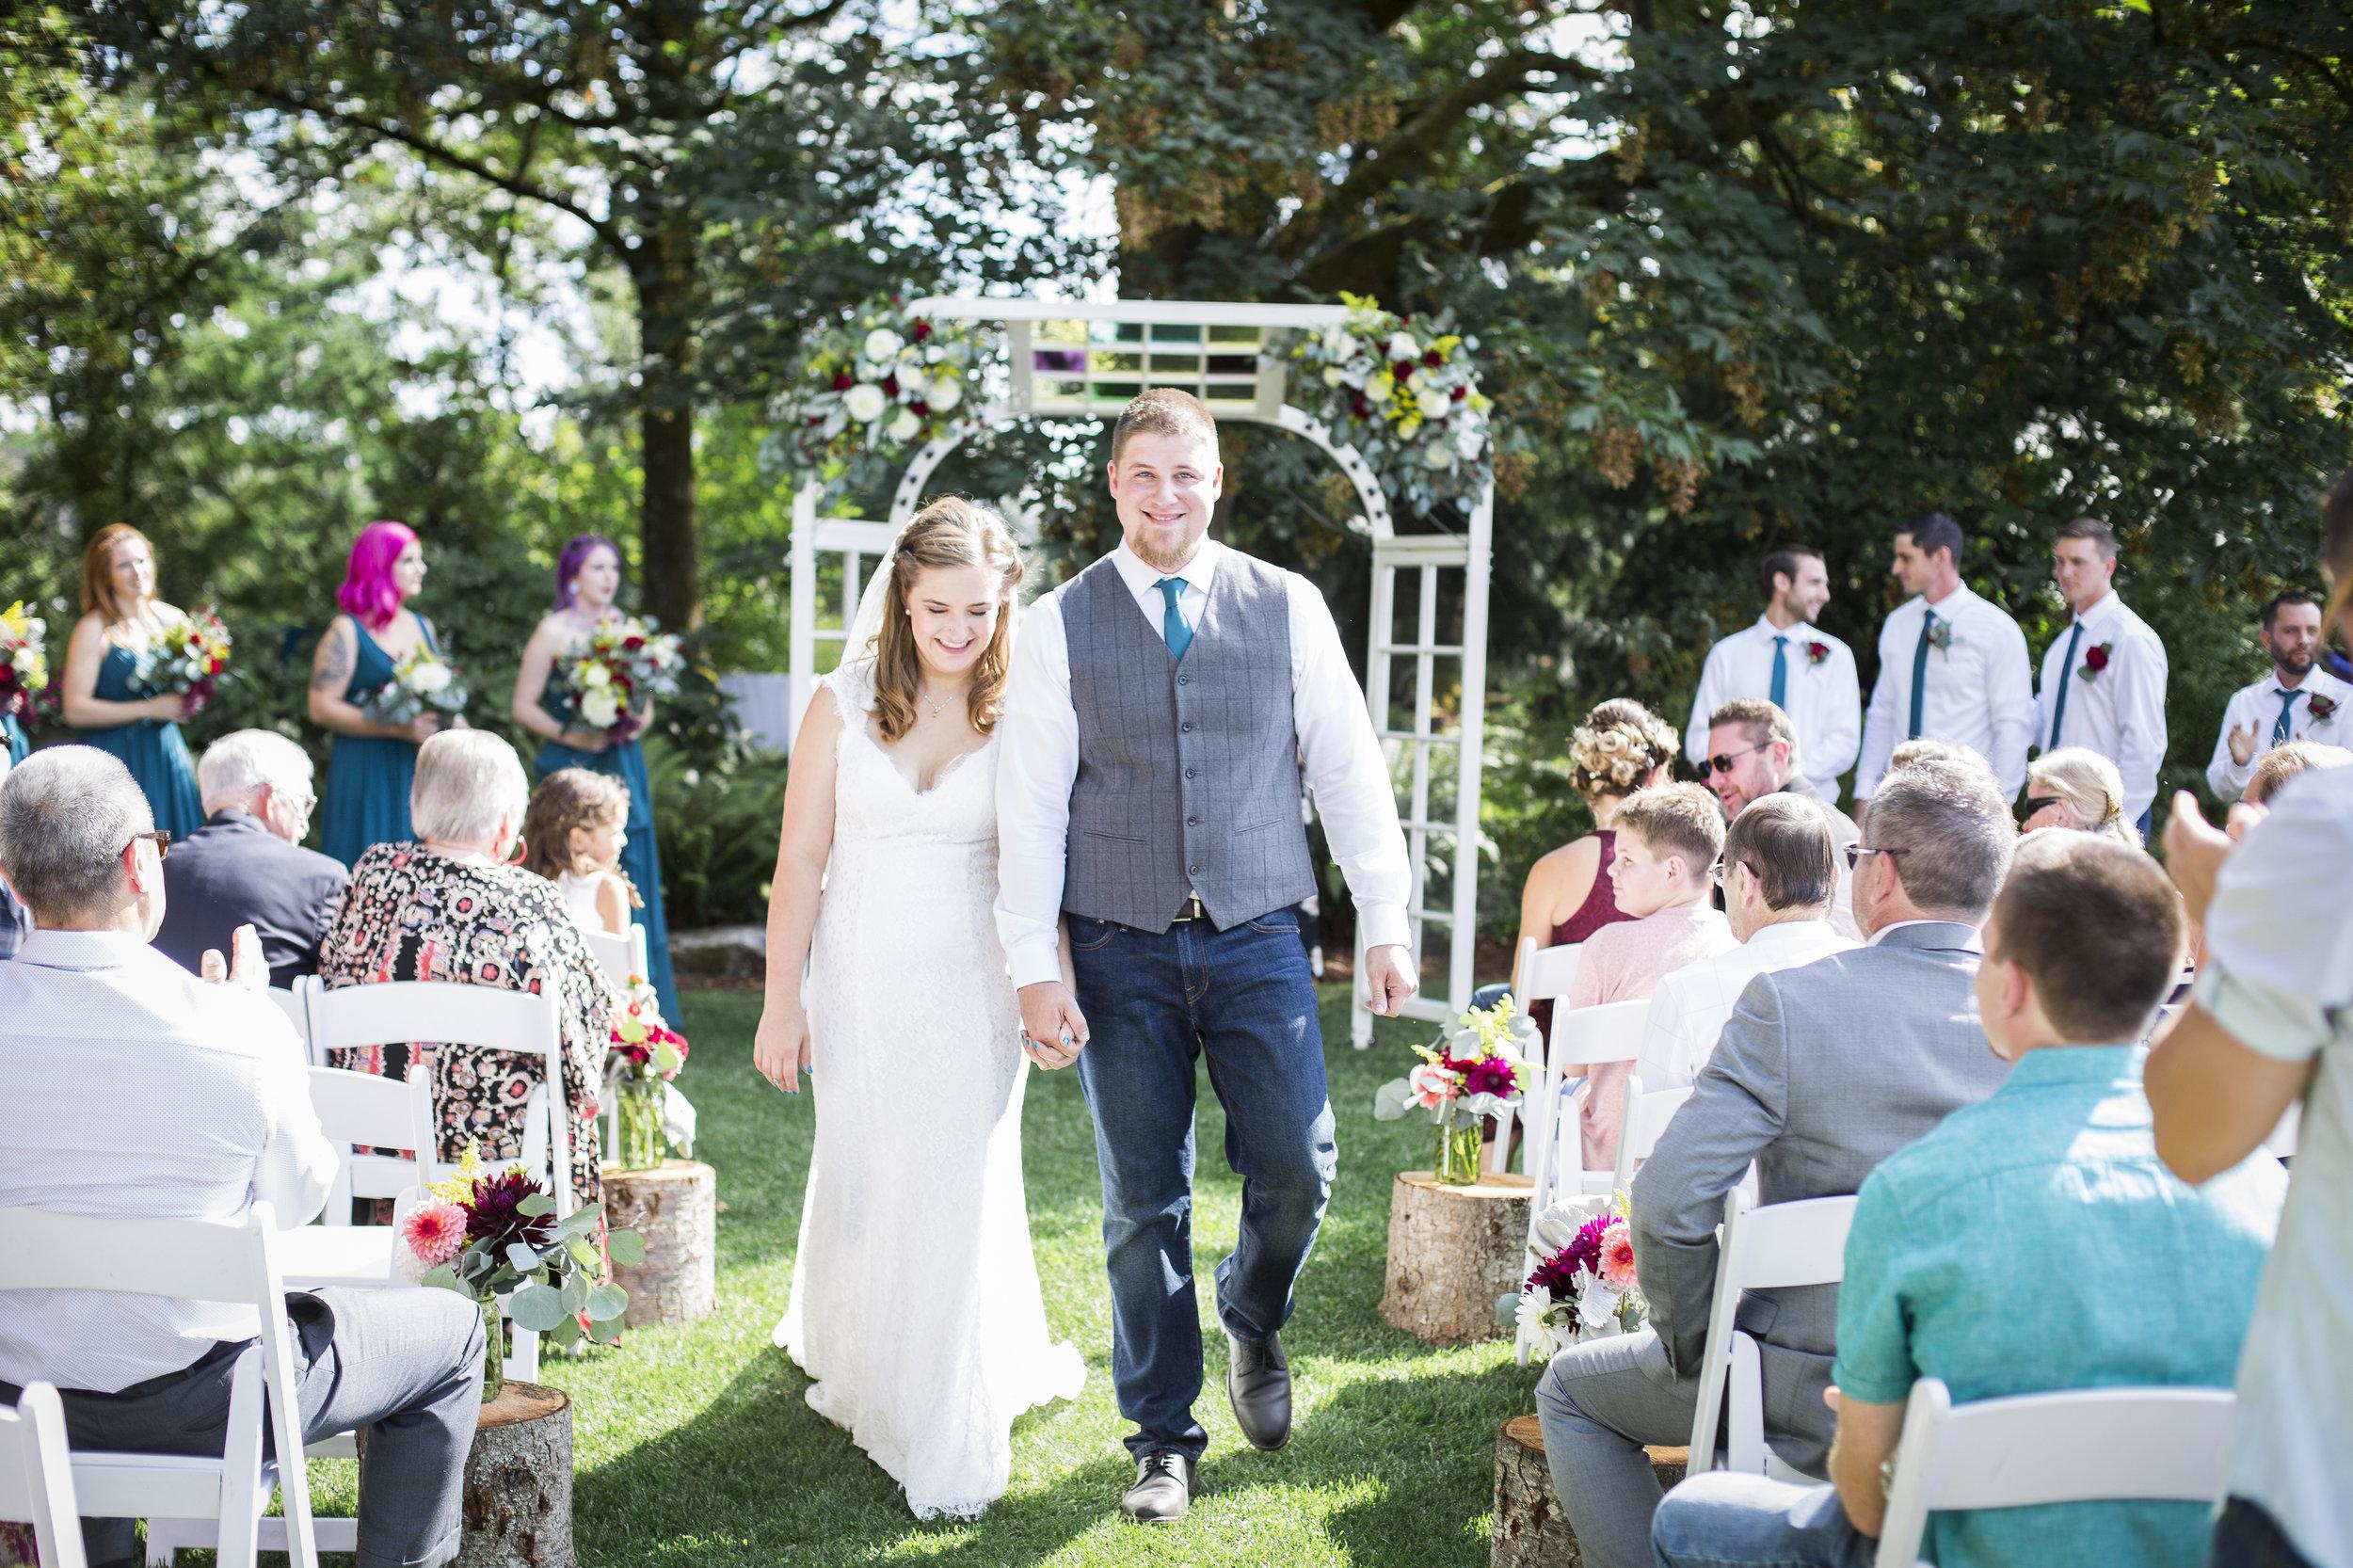 Seattle-Tacoma-Wedding-Photographer-Jaeda-Reed-Fall-Glenwood-Tree-Farm-07.jpg